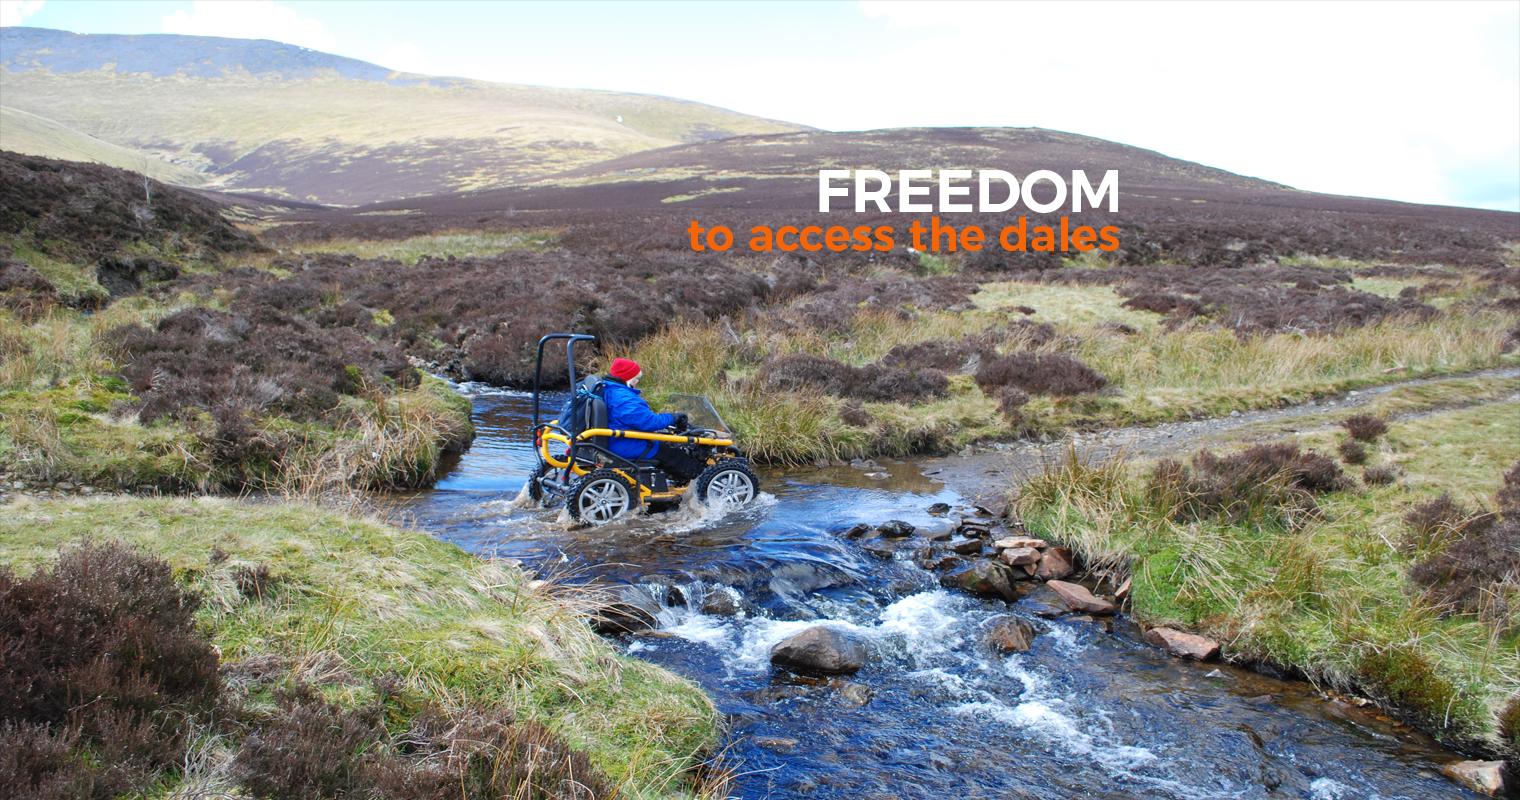 slide-9-terrainhopper-free-to-access-dales